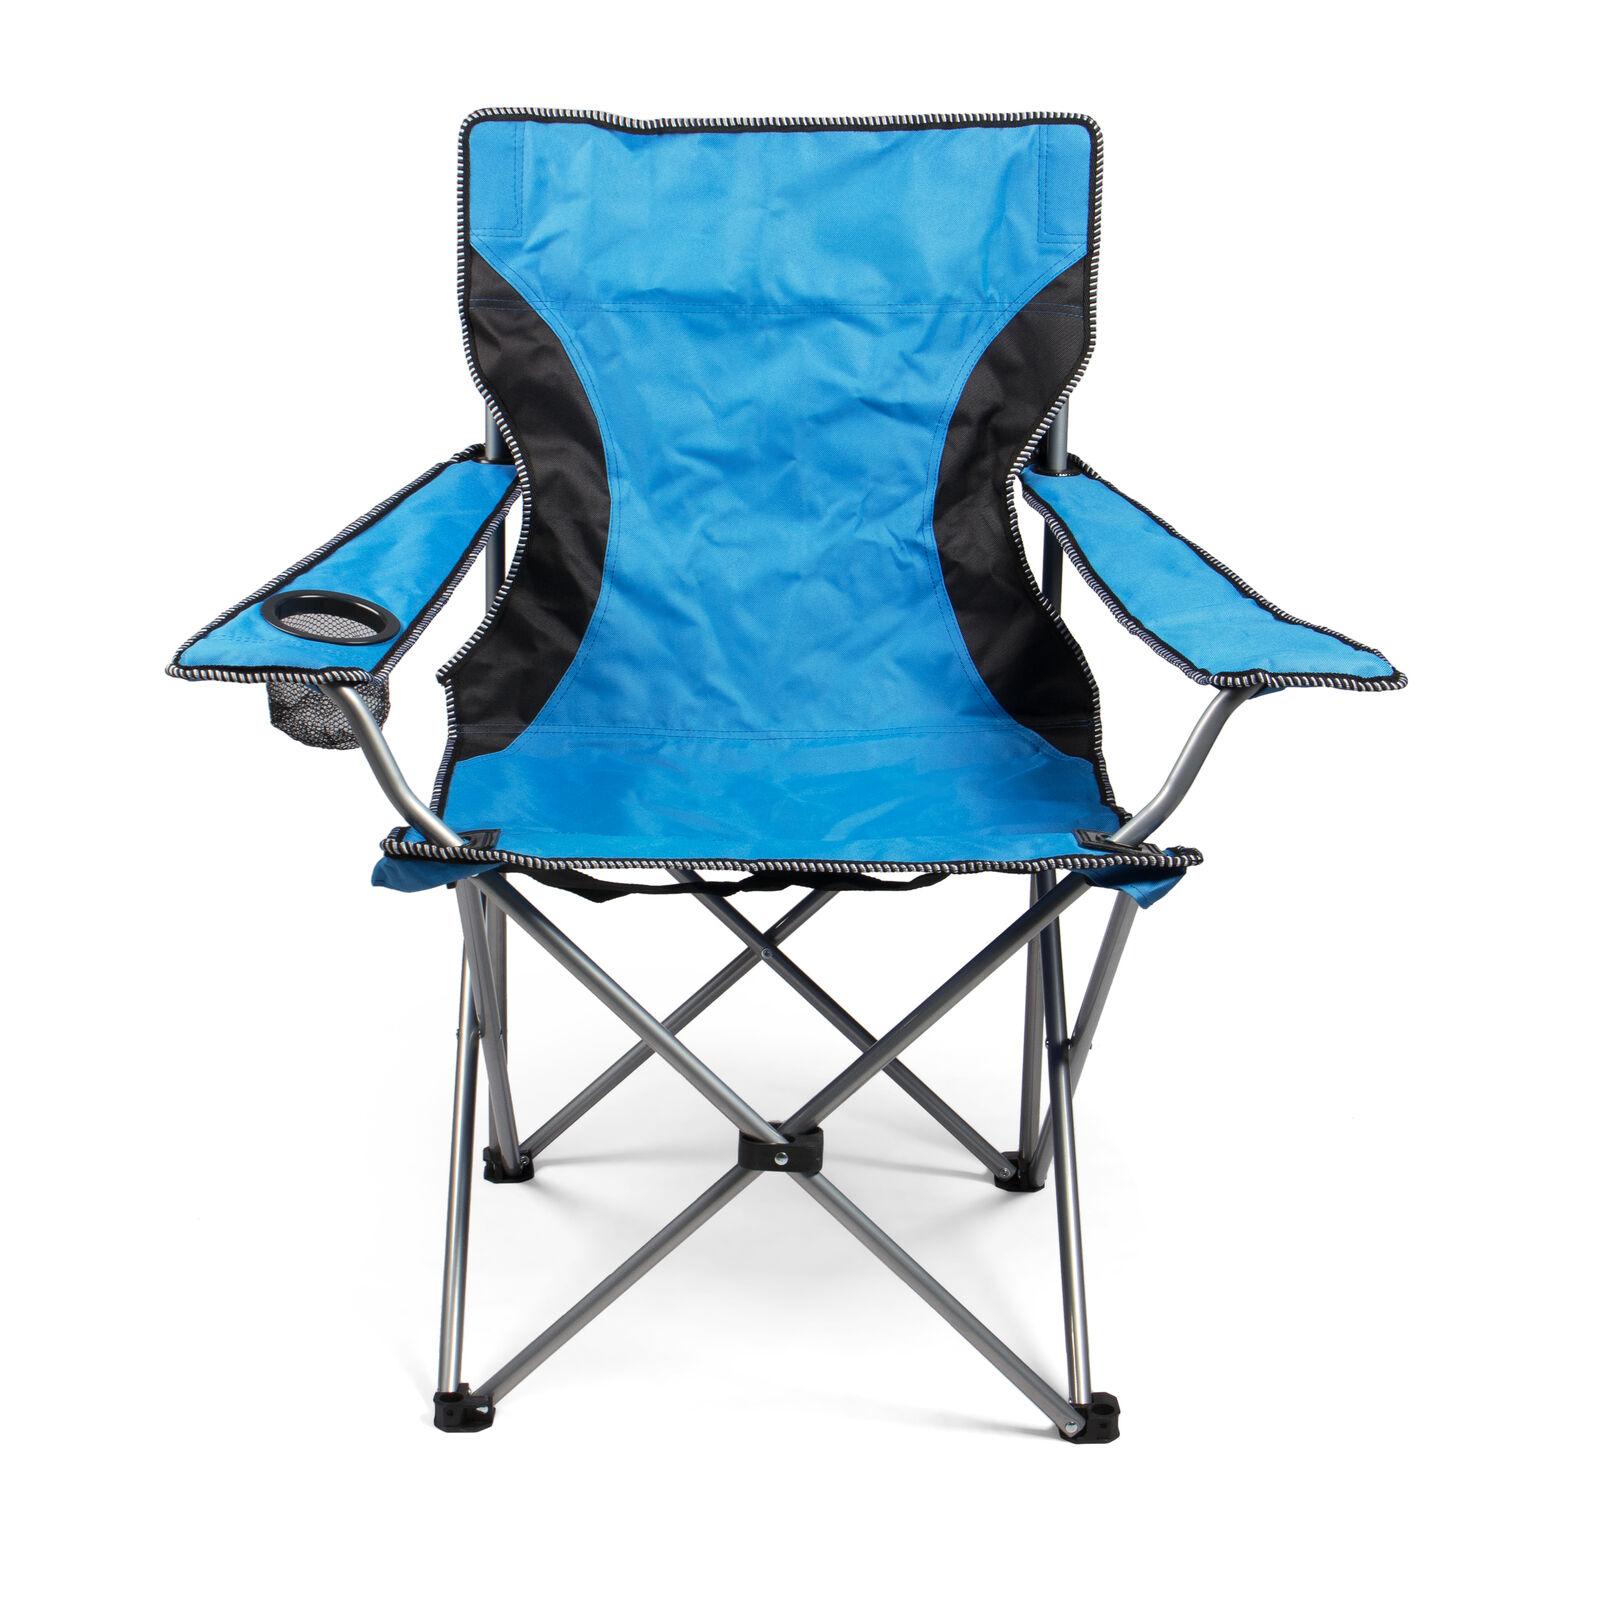 s l1600 - Wanderlust Silla Camping Plegable Playa Festival Pescar